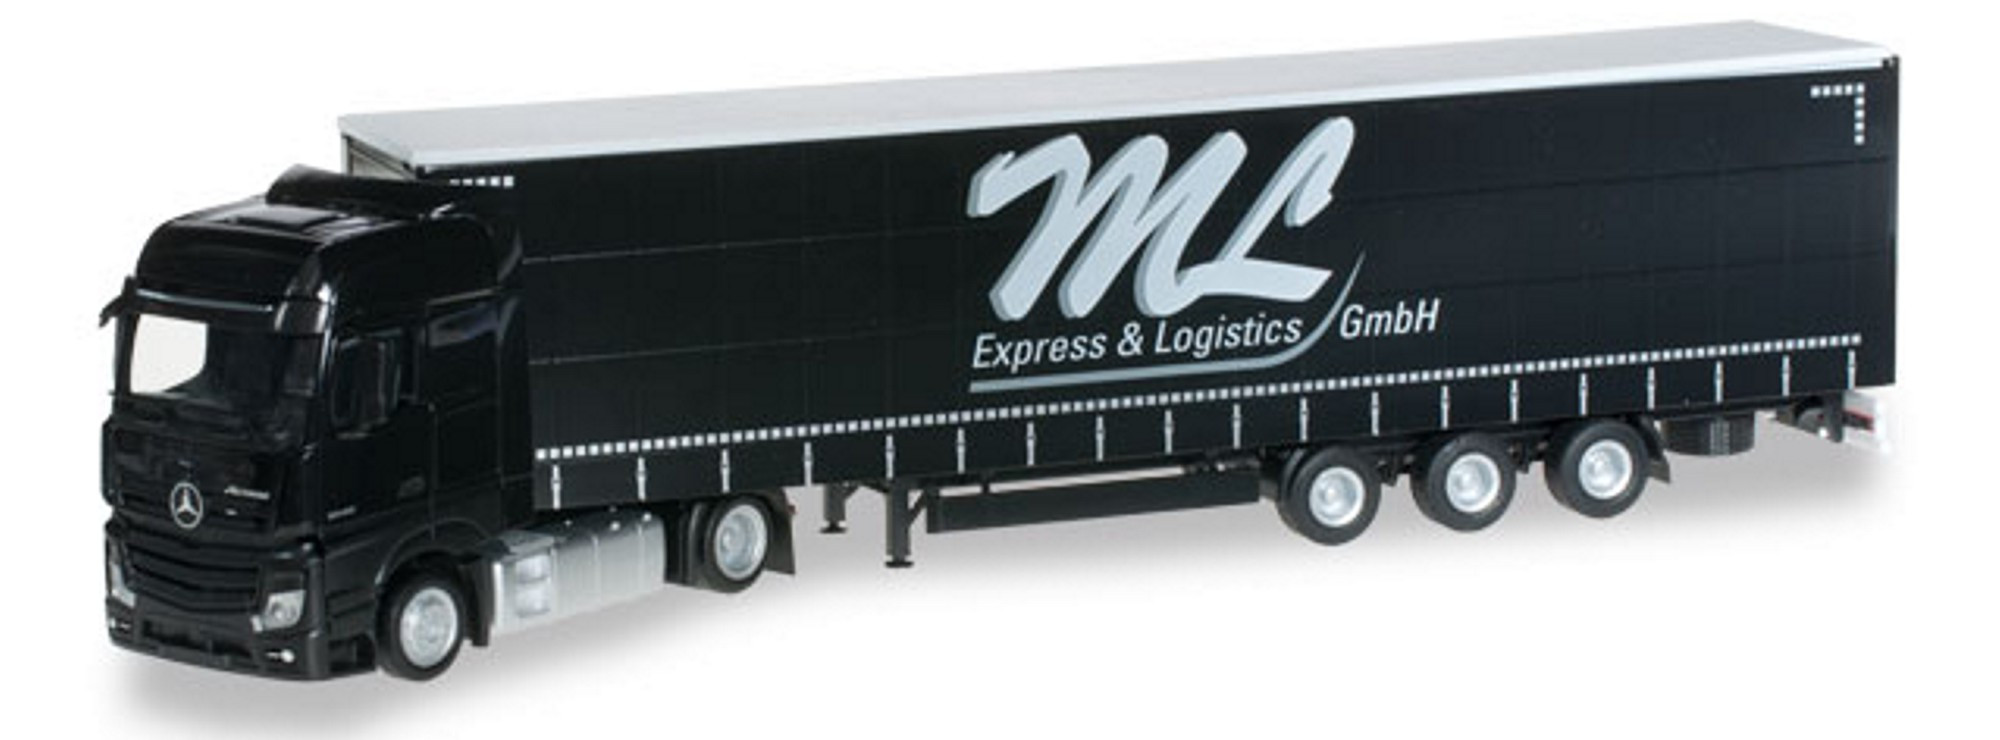 Herpa MB Actros Bigspace JuGaPlSzg ML Express und Logistic (Einzelstück)